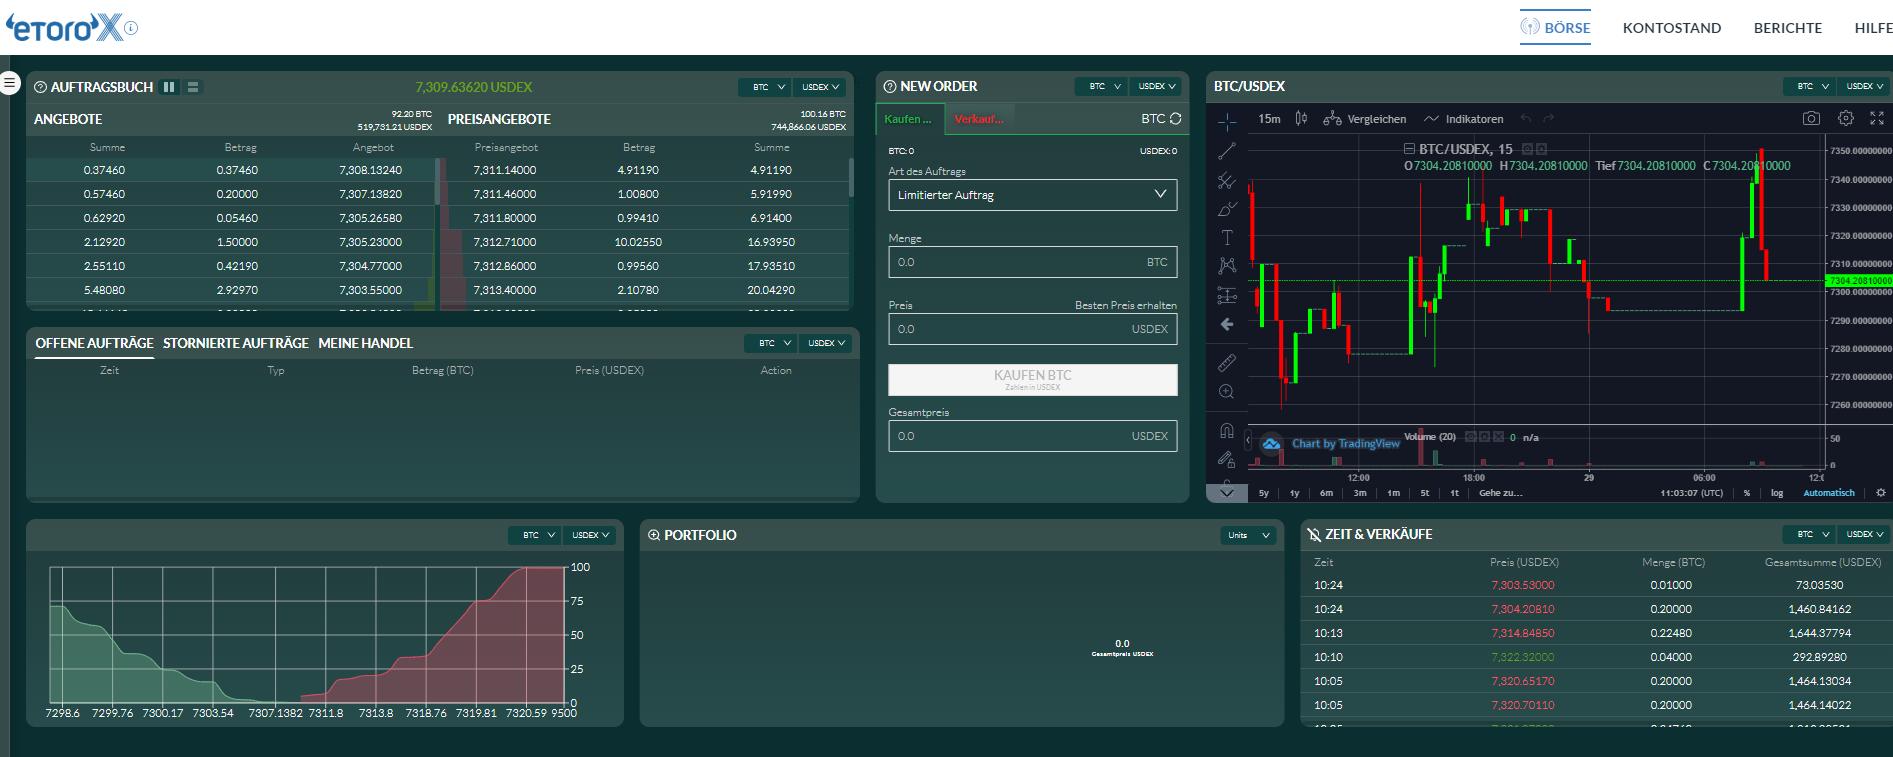 eToroX Screenshot